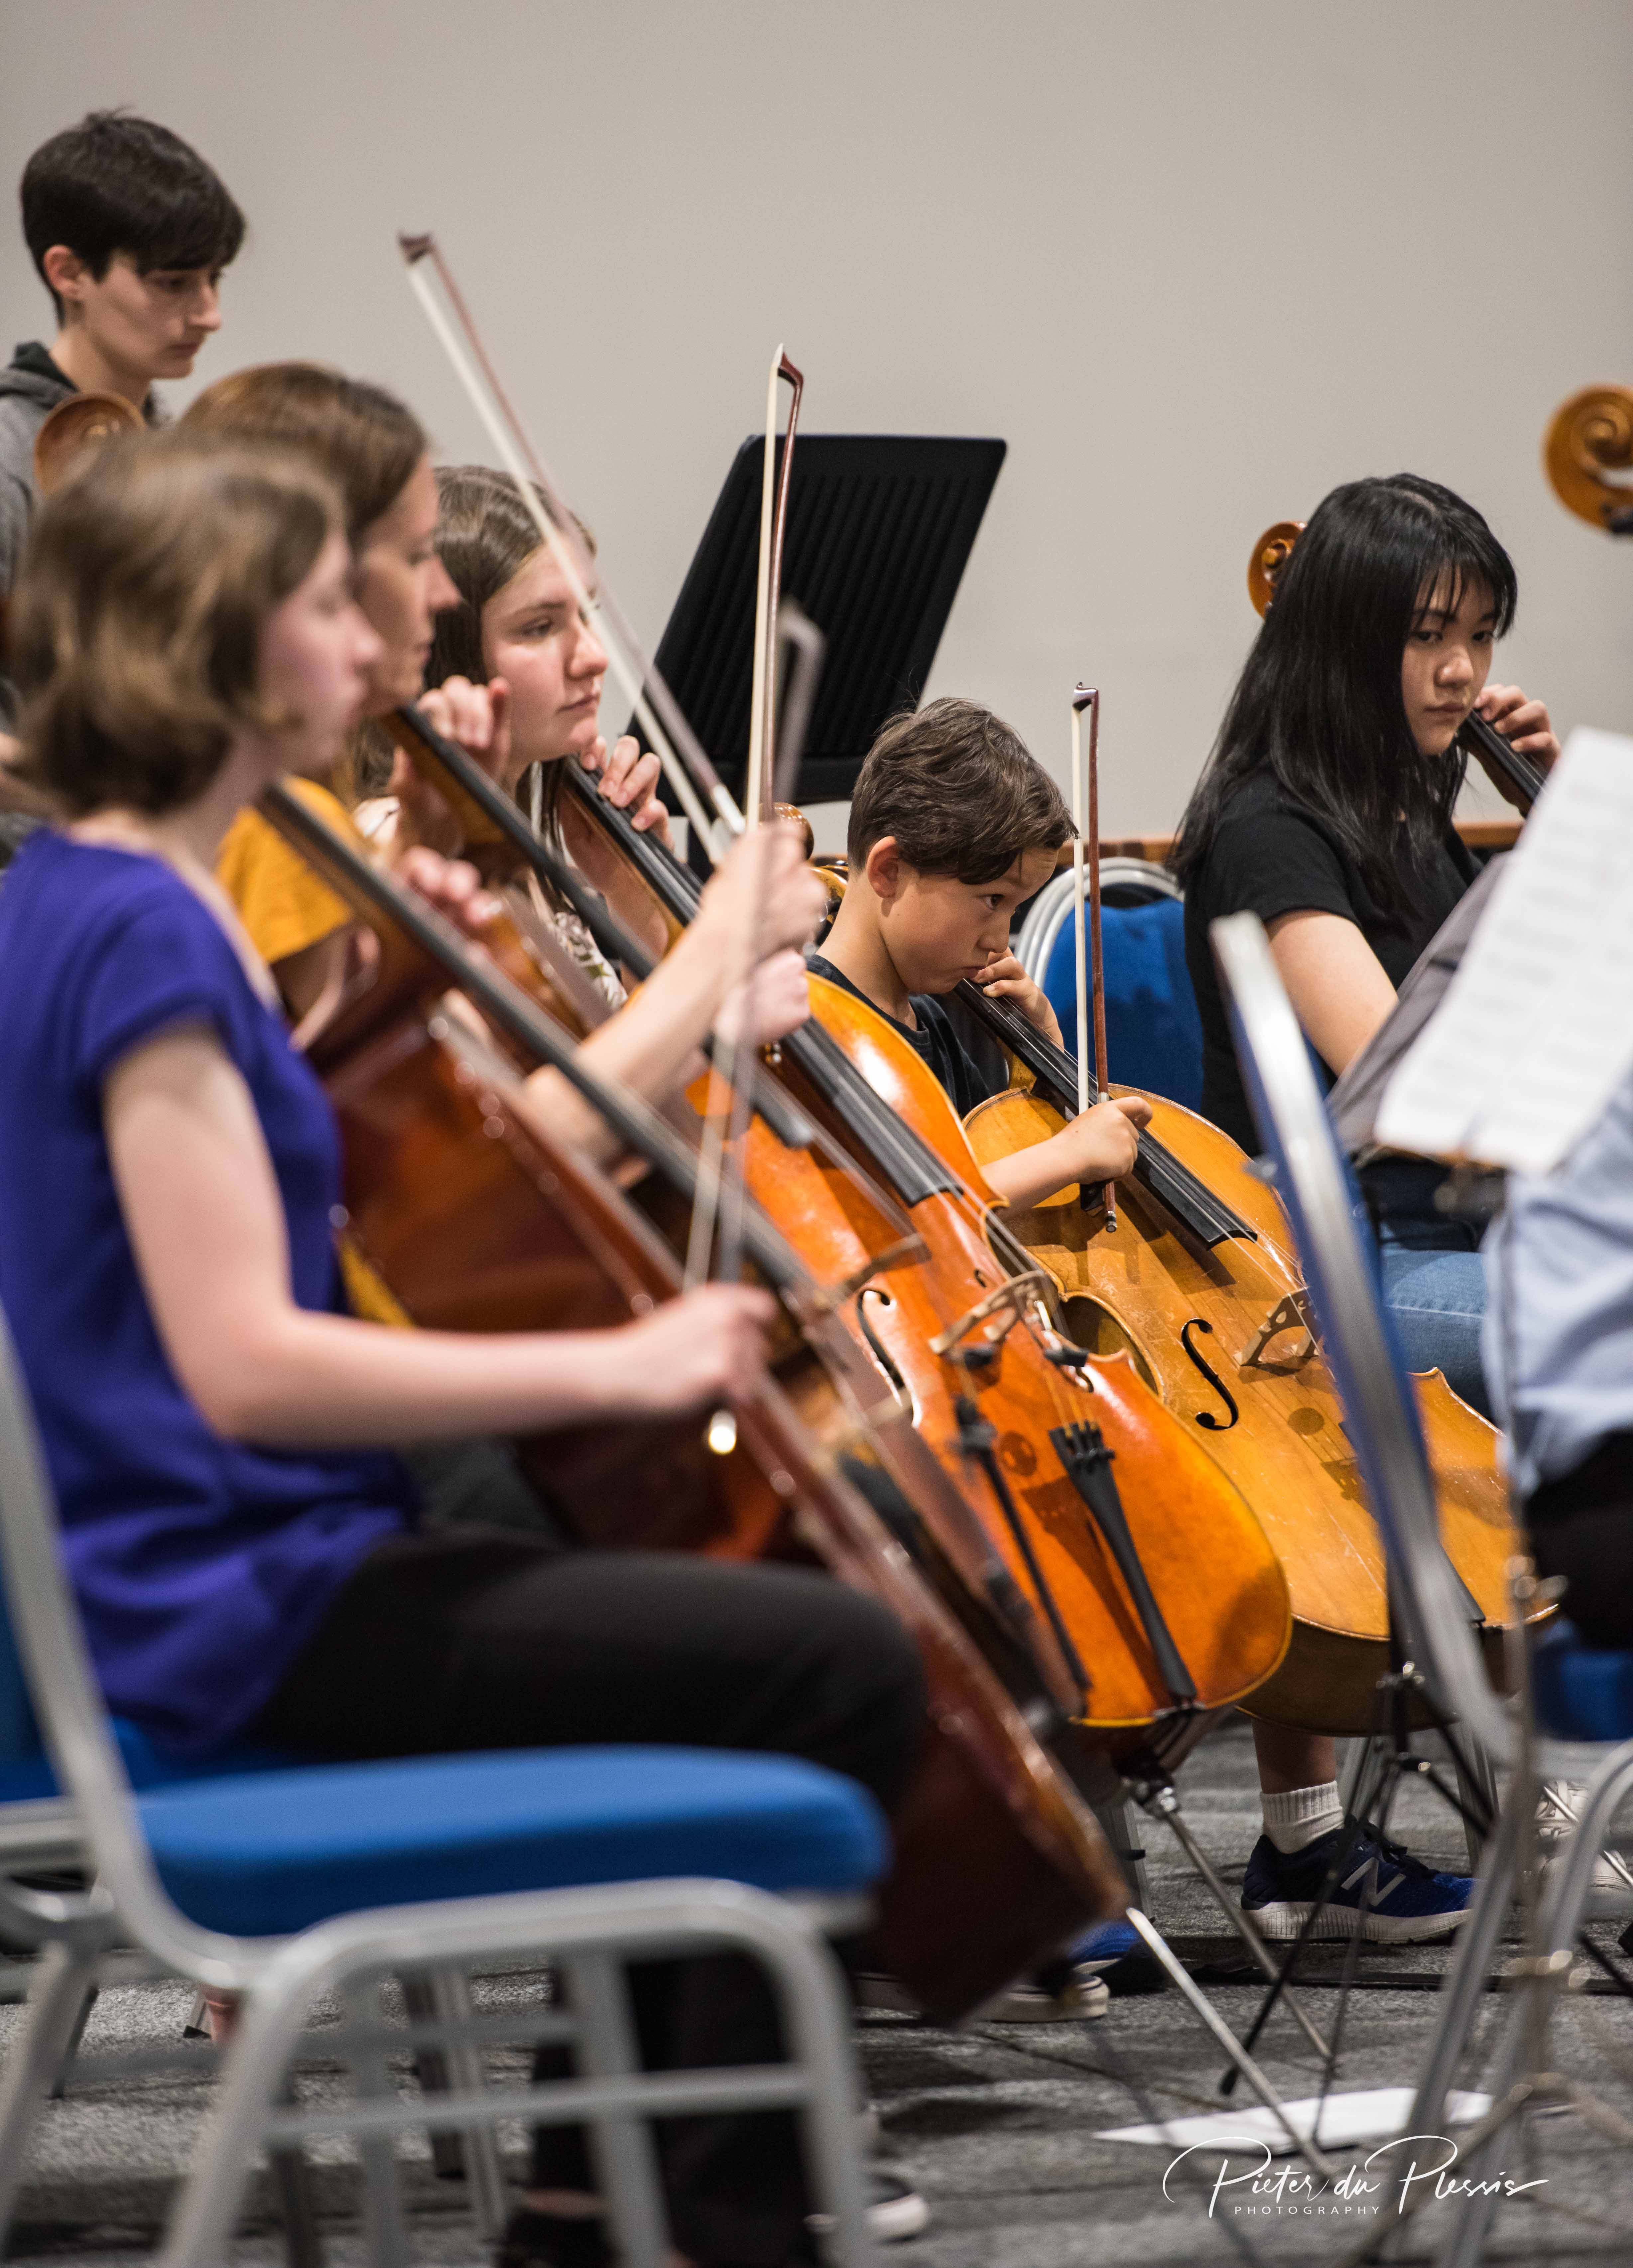 Cello For Africa-14